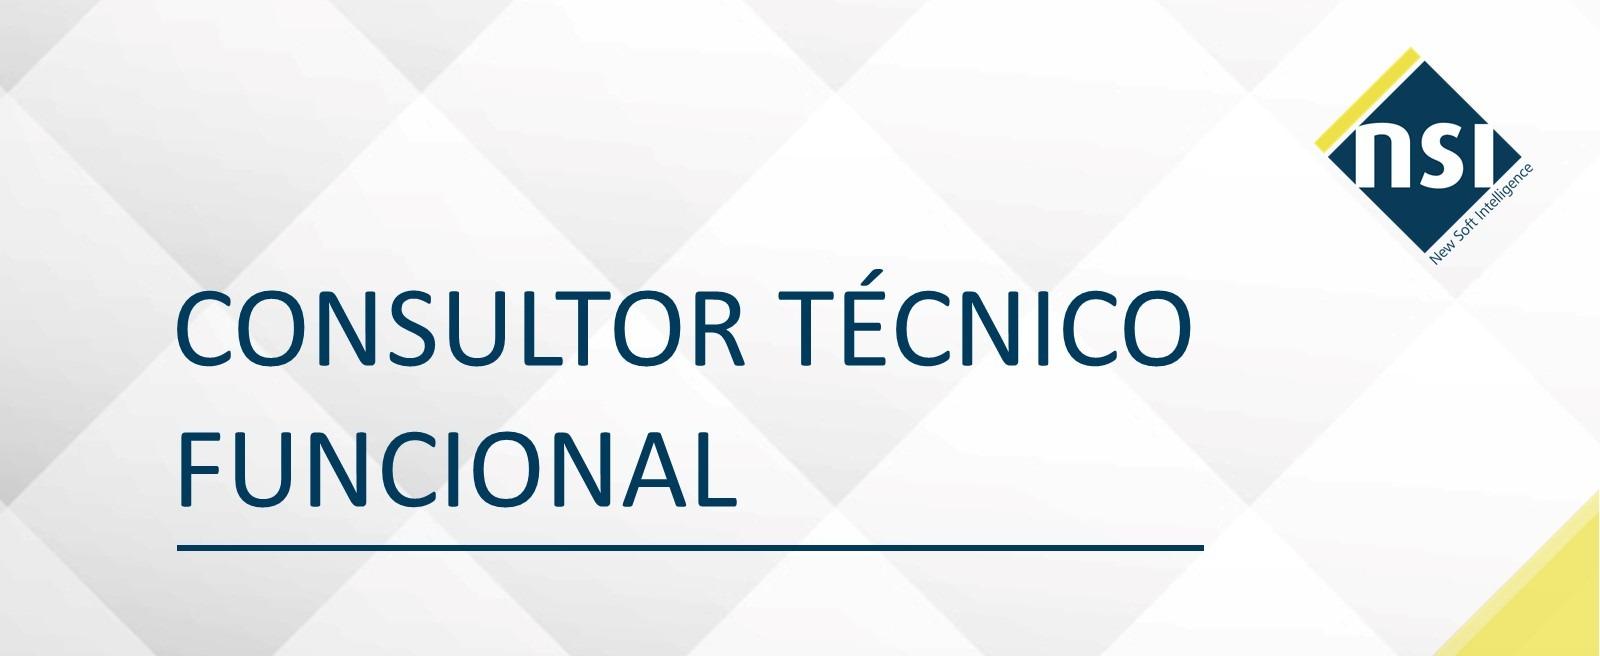 Consultor Técnico Funcional